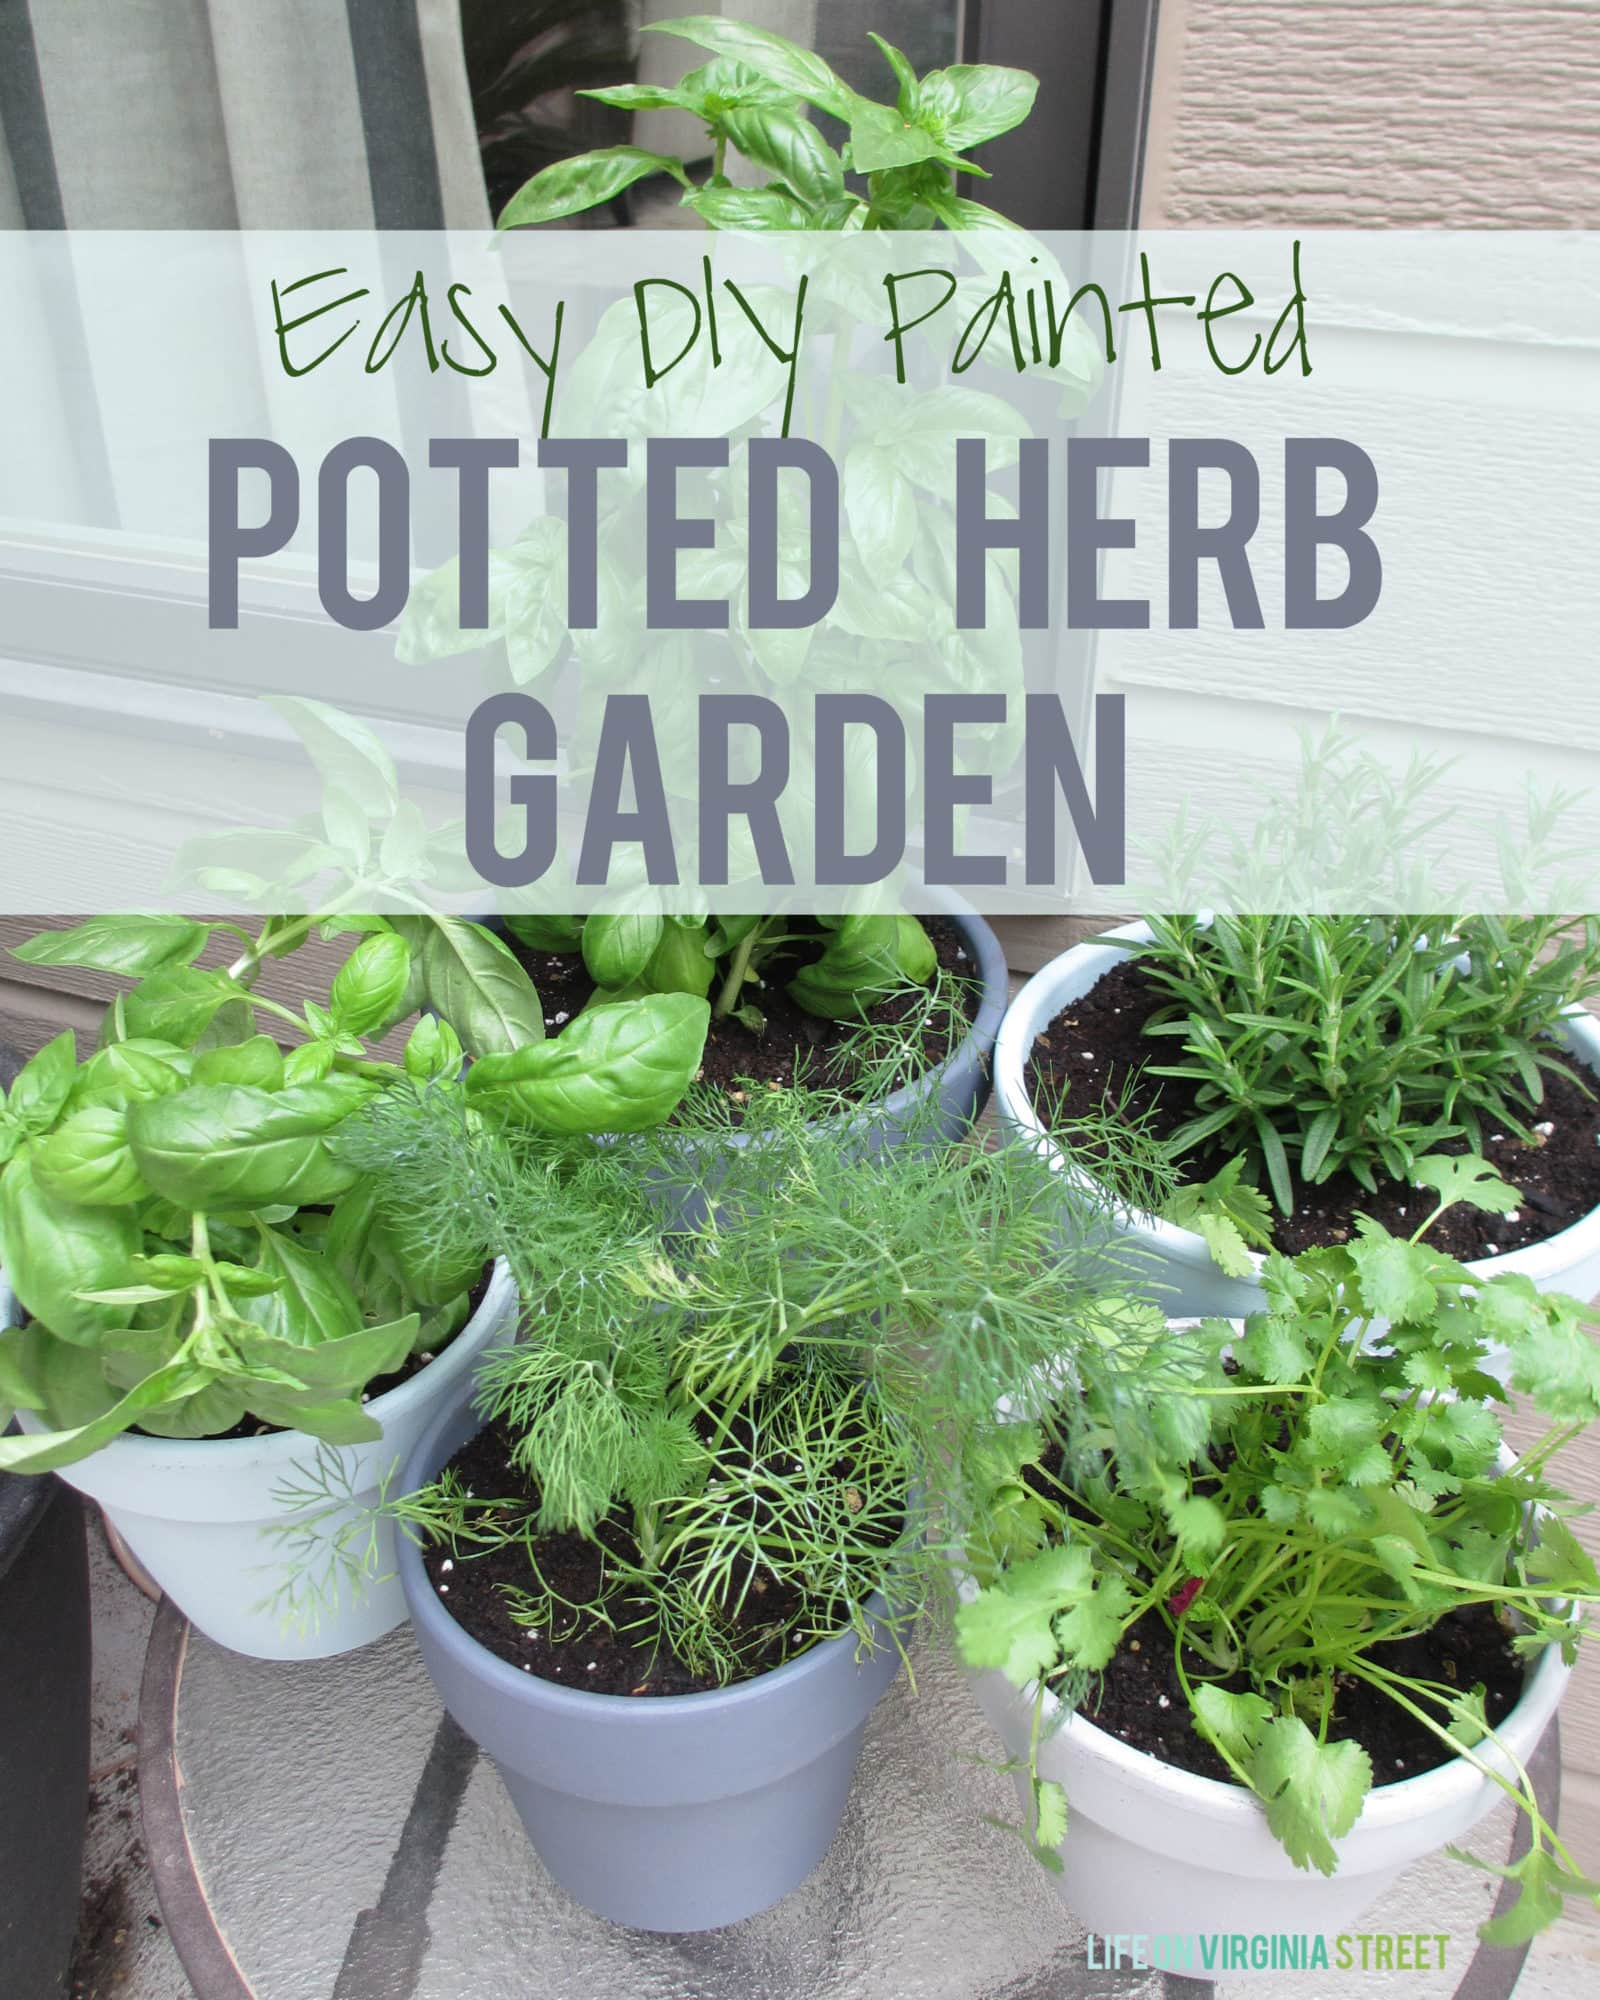 Diy painted potted herb garden life on virginia street sisterspd